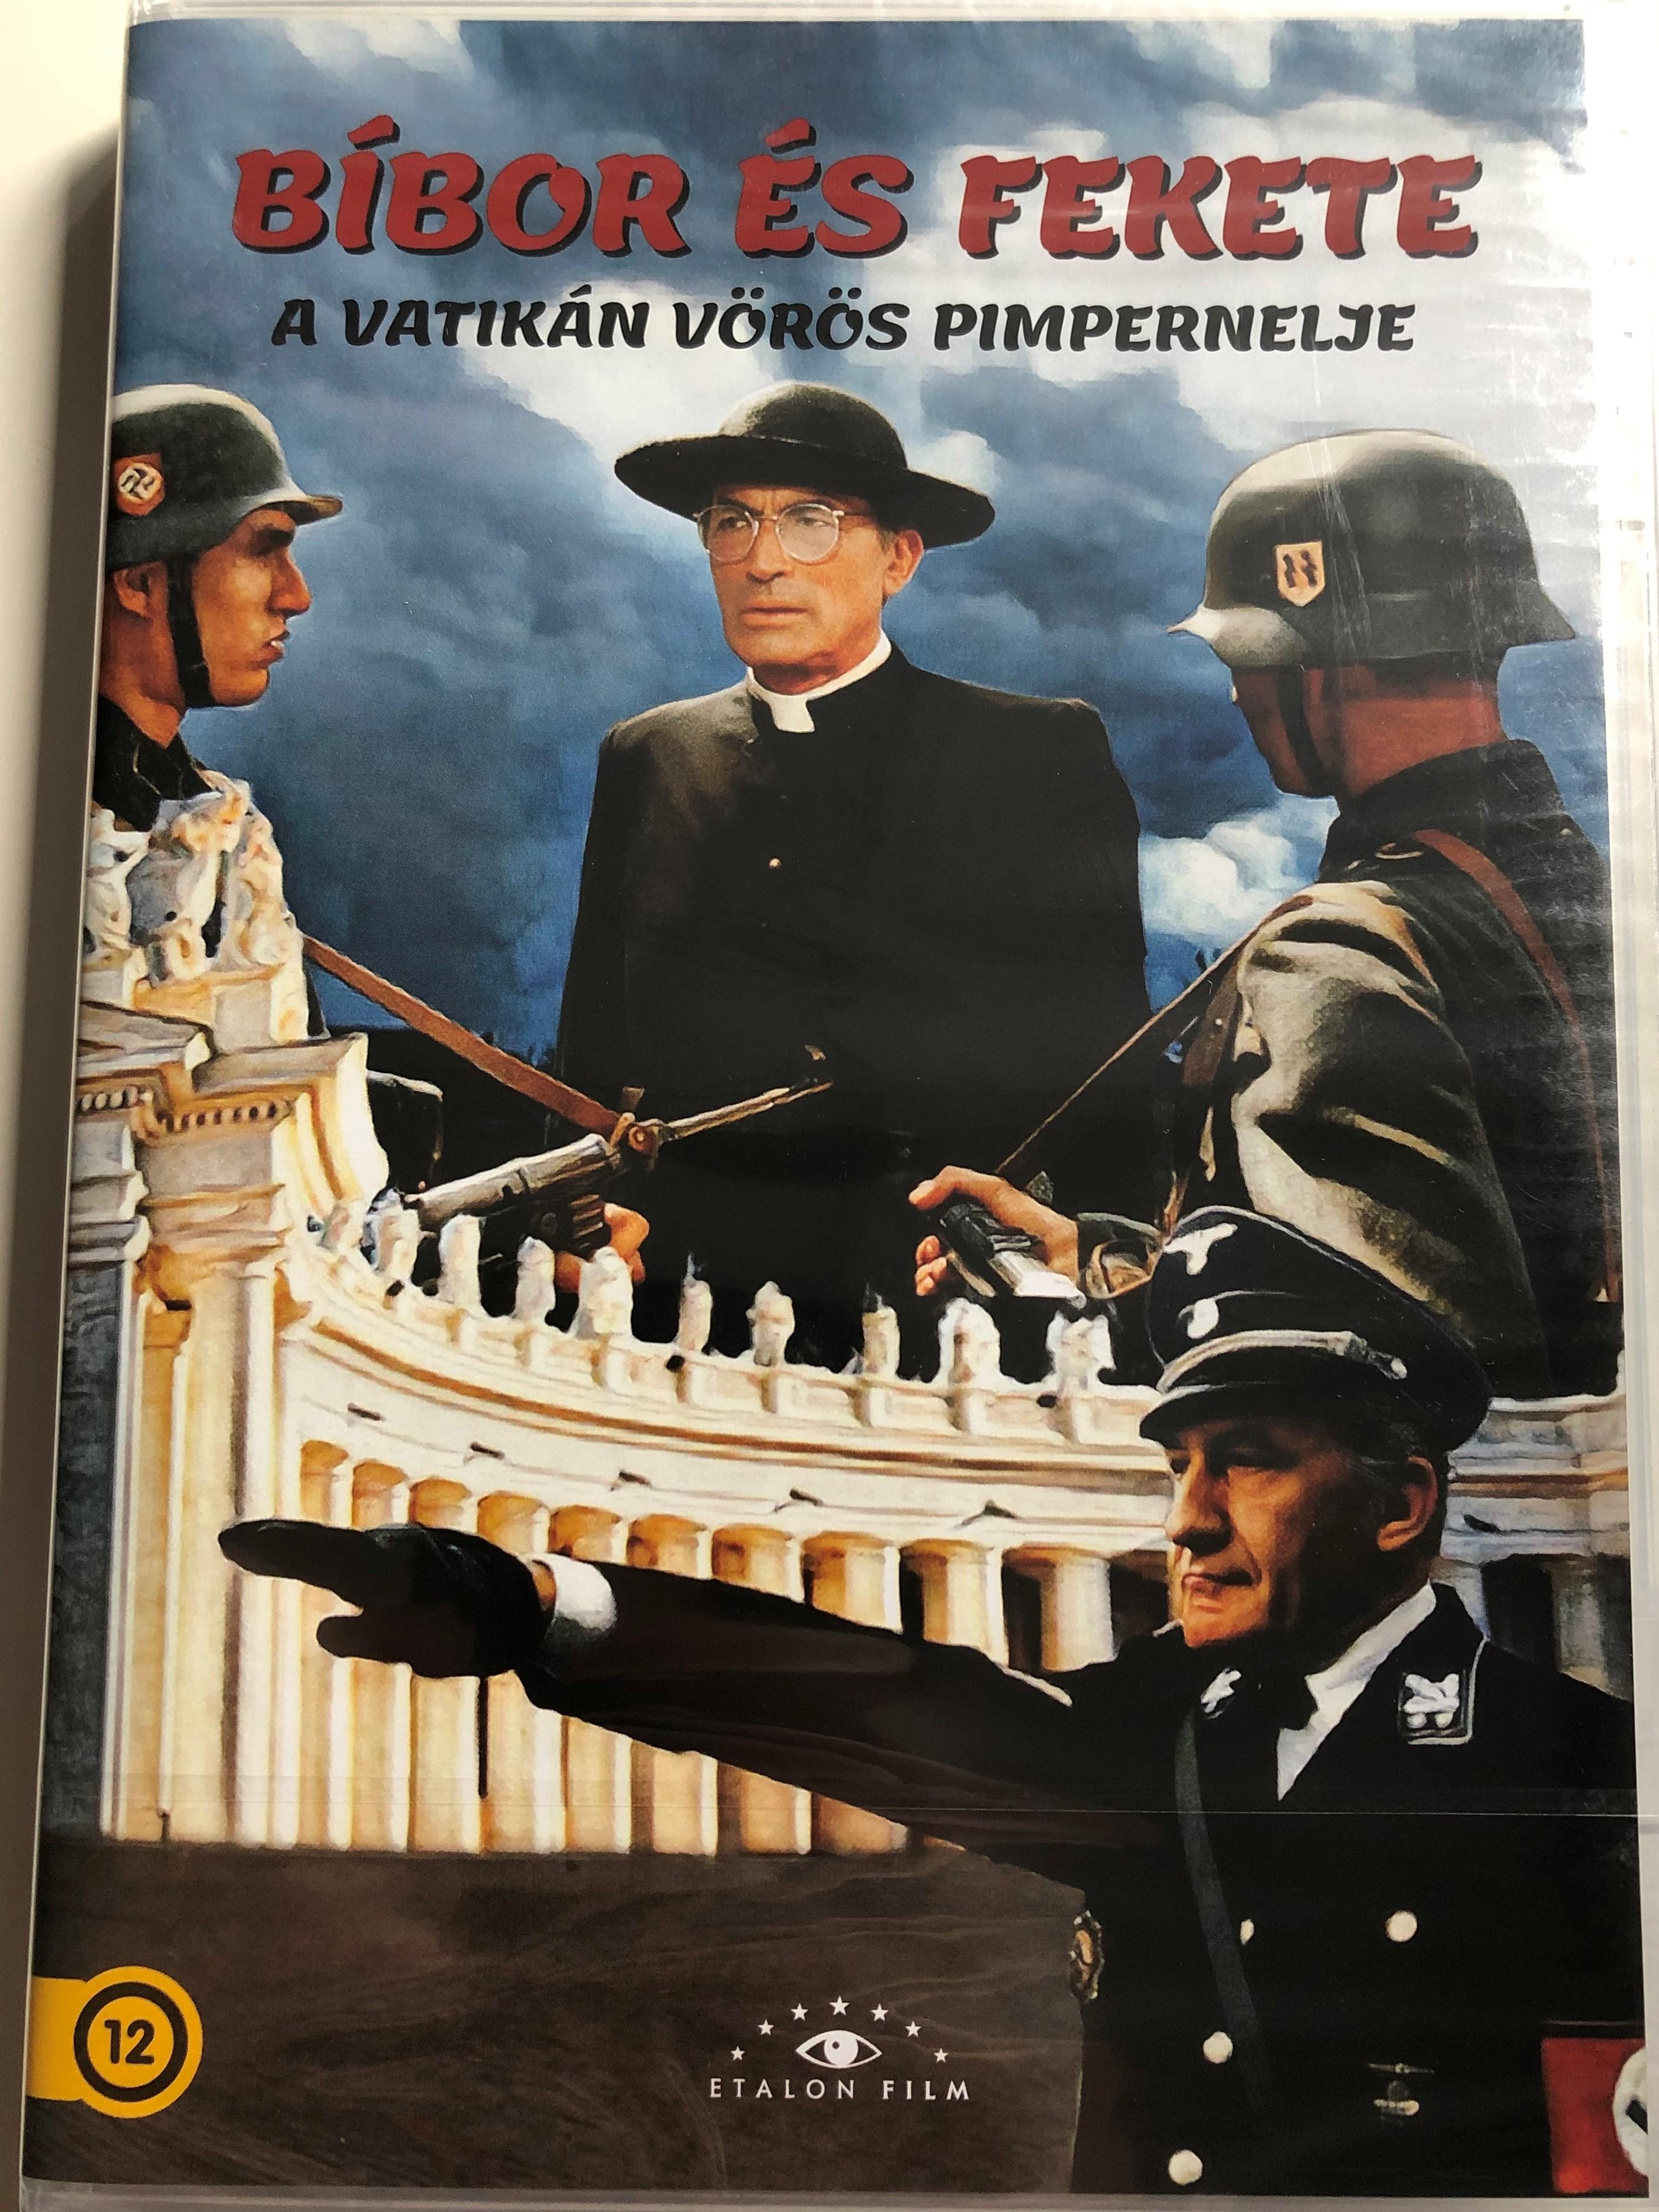 the-scarlet-and-the-black-dvd-1983-b-bor-s-fekete-a-vatik-n-v-r-s-pimpernelje-1.jpg